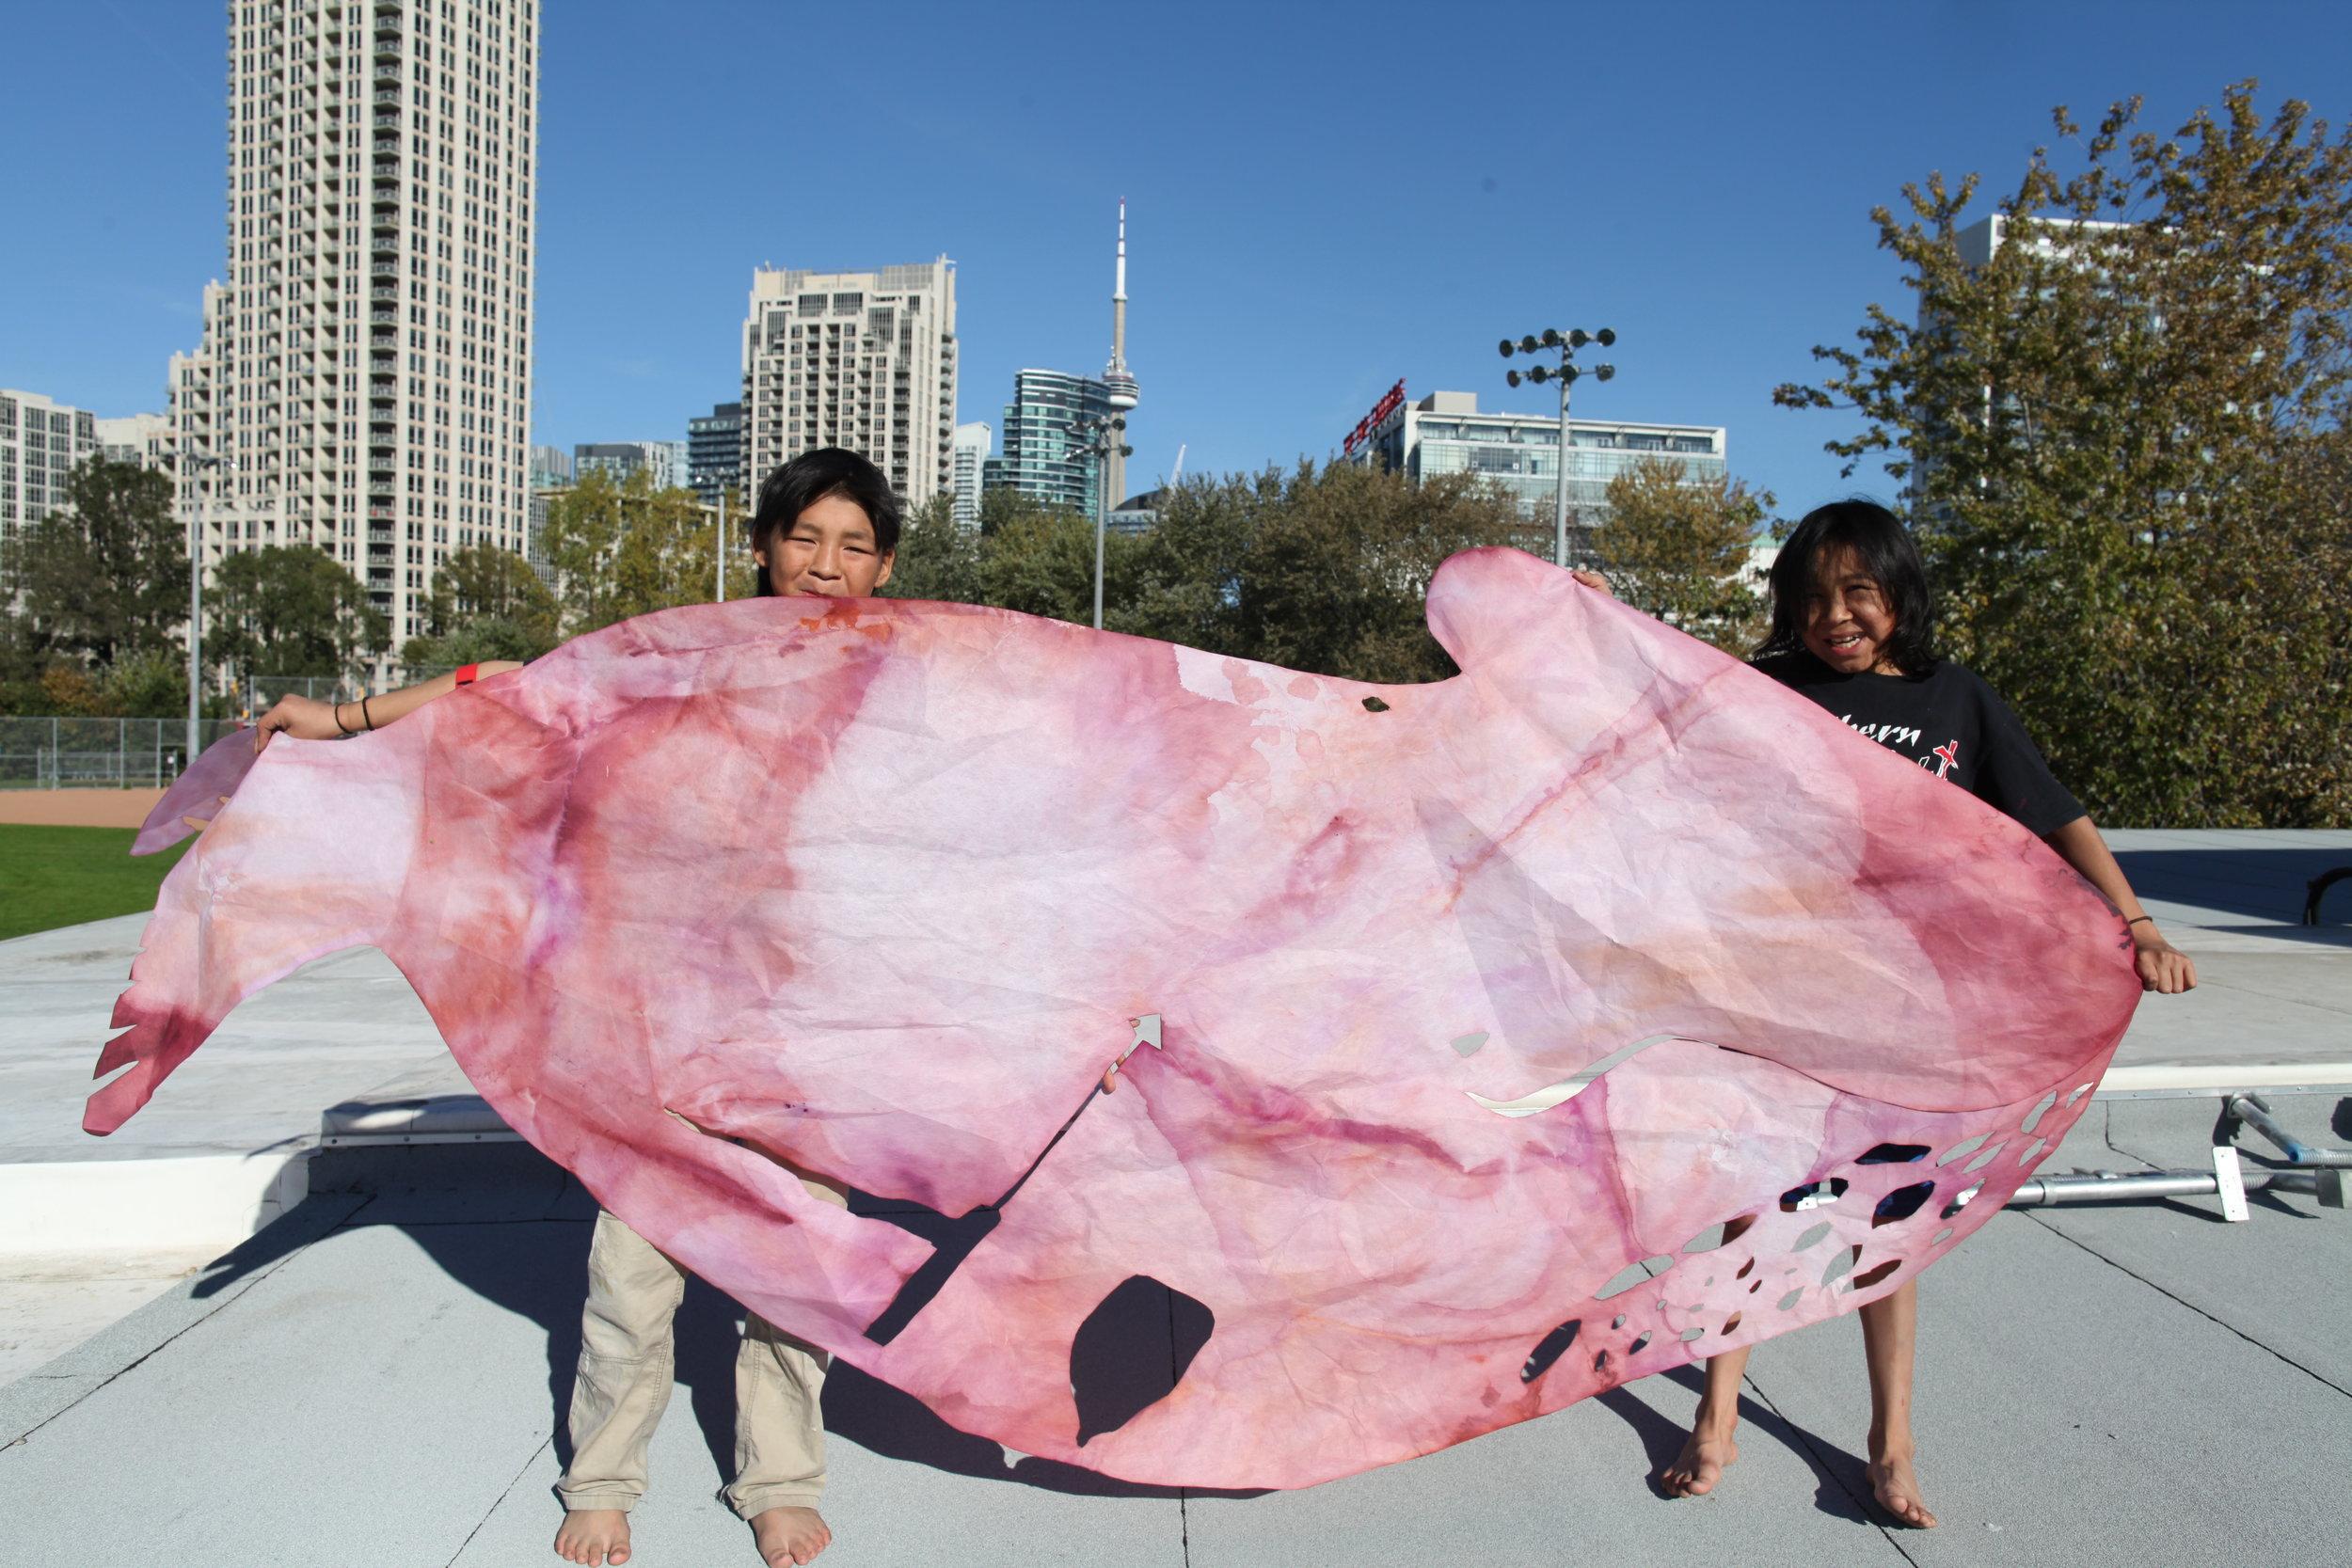 Whale by Taqialuk Pudlat, held by Iqaluk Quvianaqtuliaq and David Pudlat